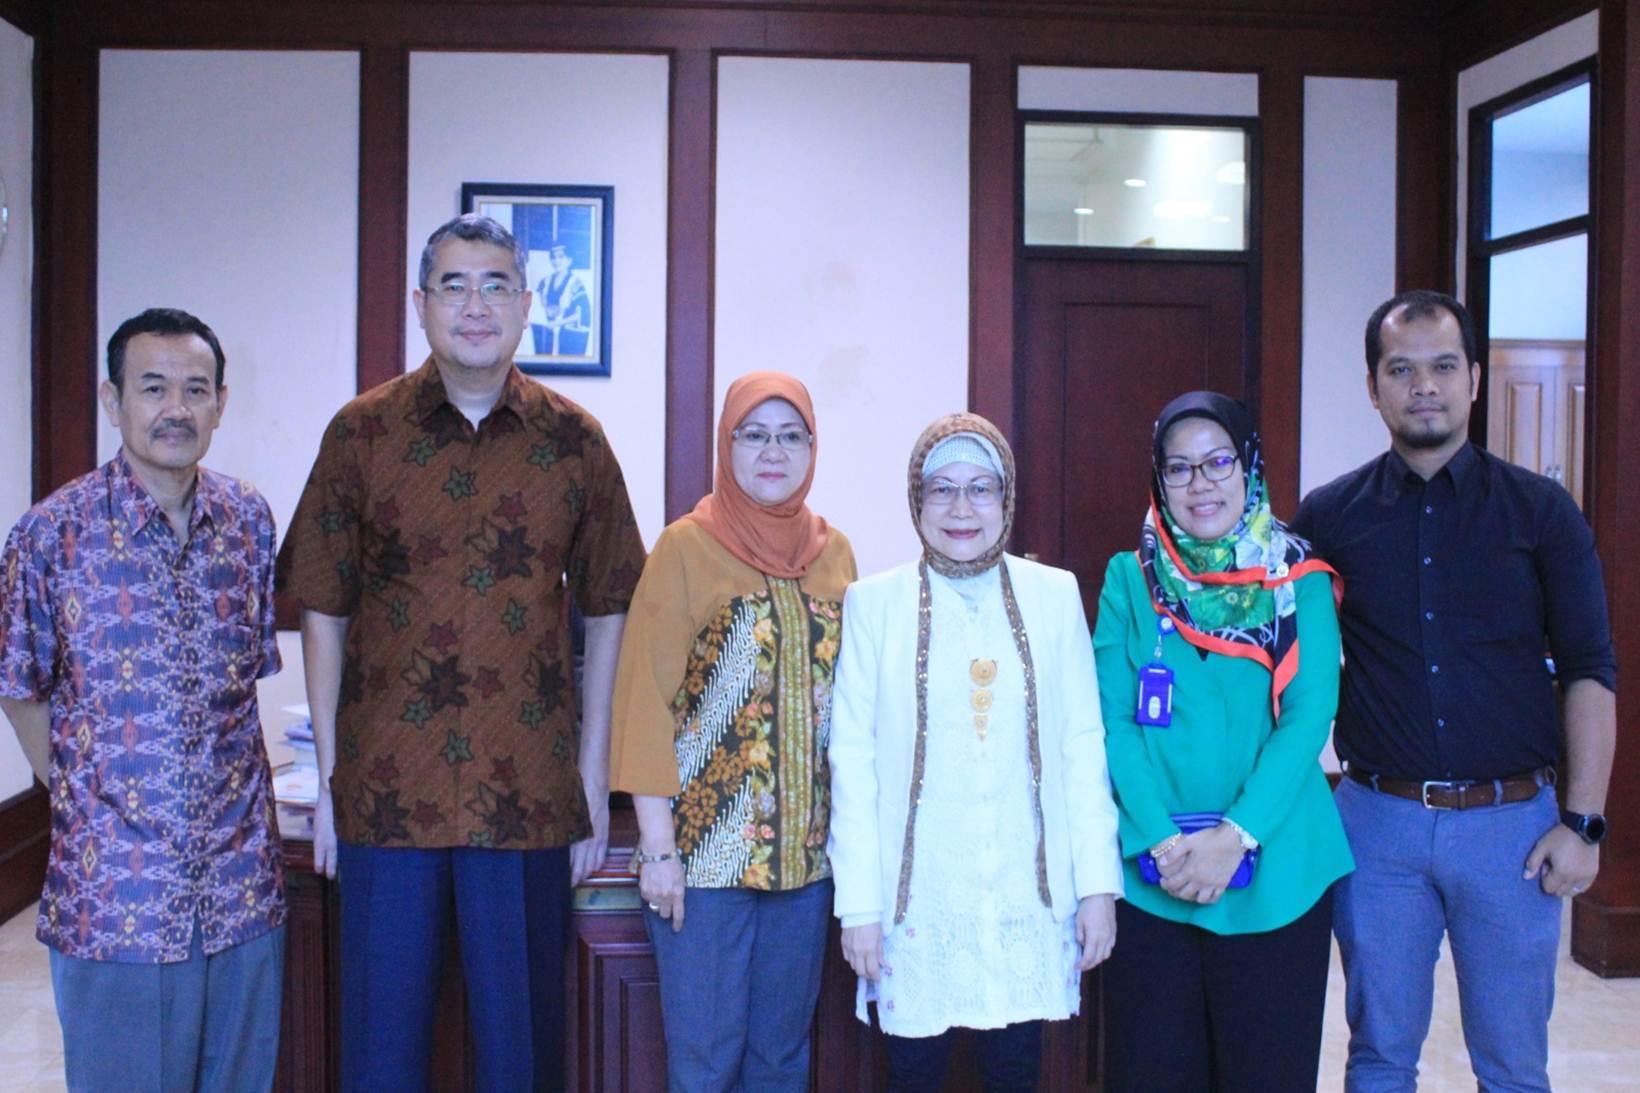 Atase Pendidikan dan Kebudayaan Manila Lakukan Penjajakan Kerjasama dengan Universitas Esa Unggul